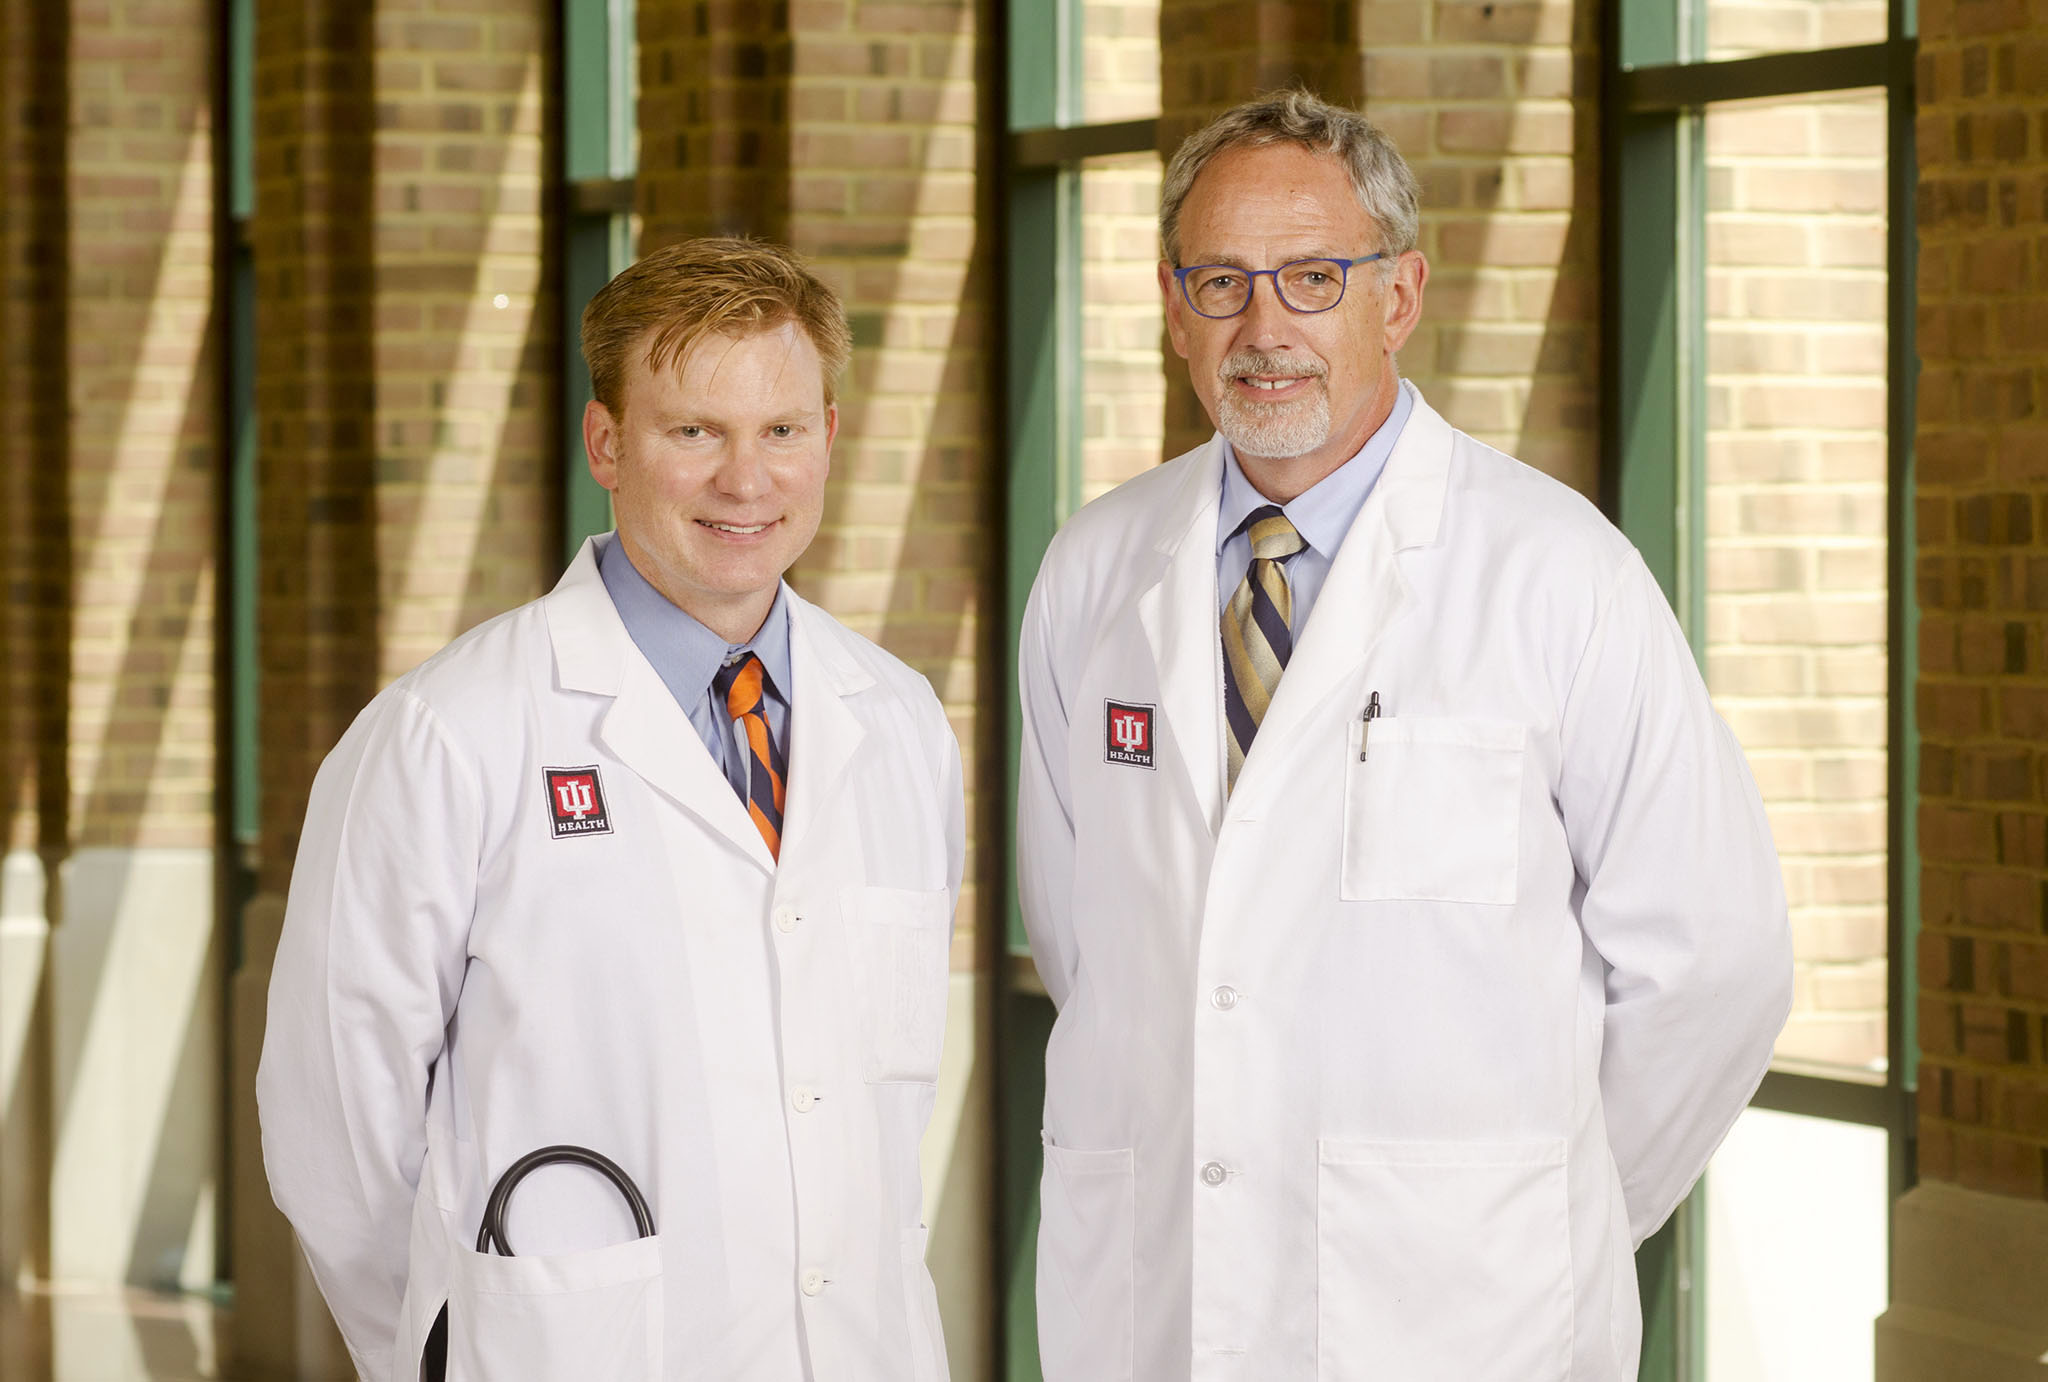 Doctors David Hart and Greg Dedinsky